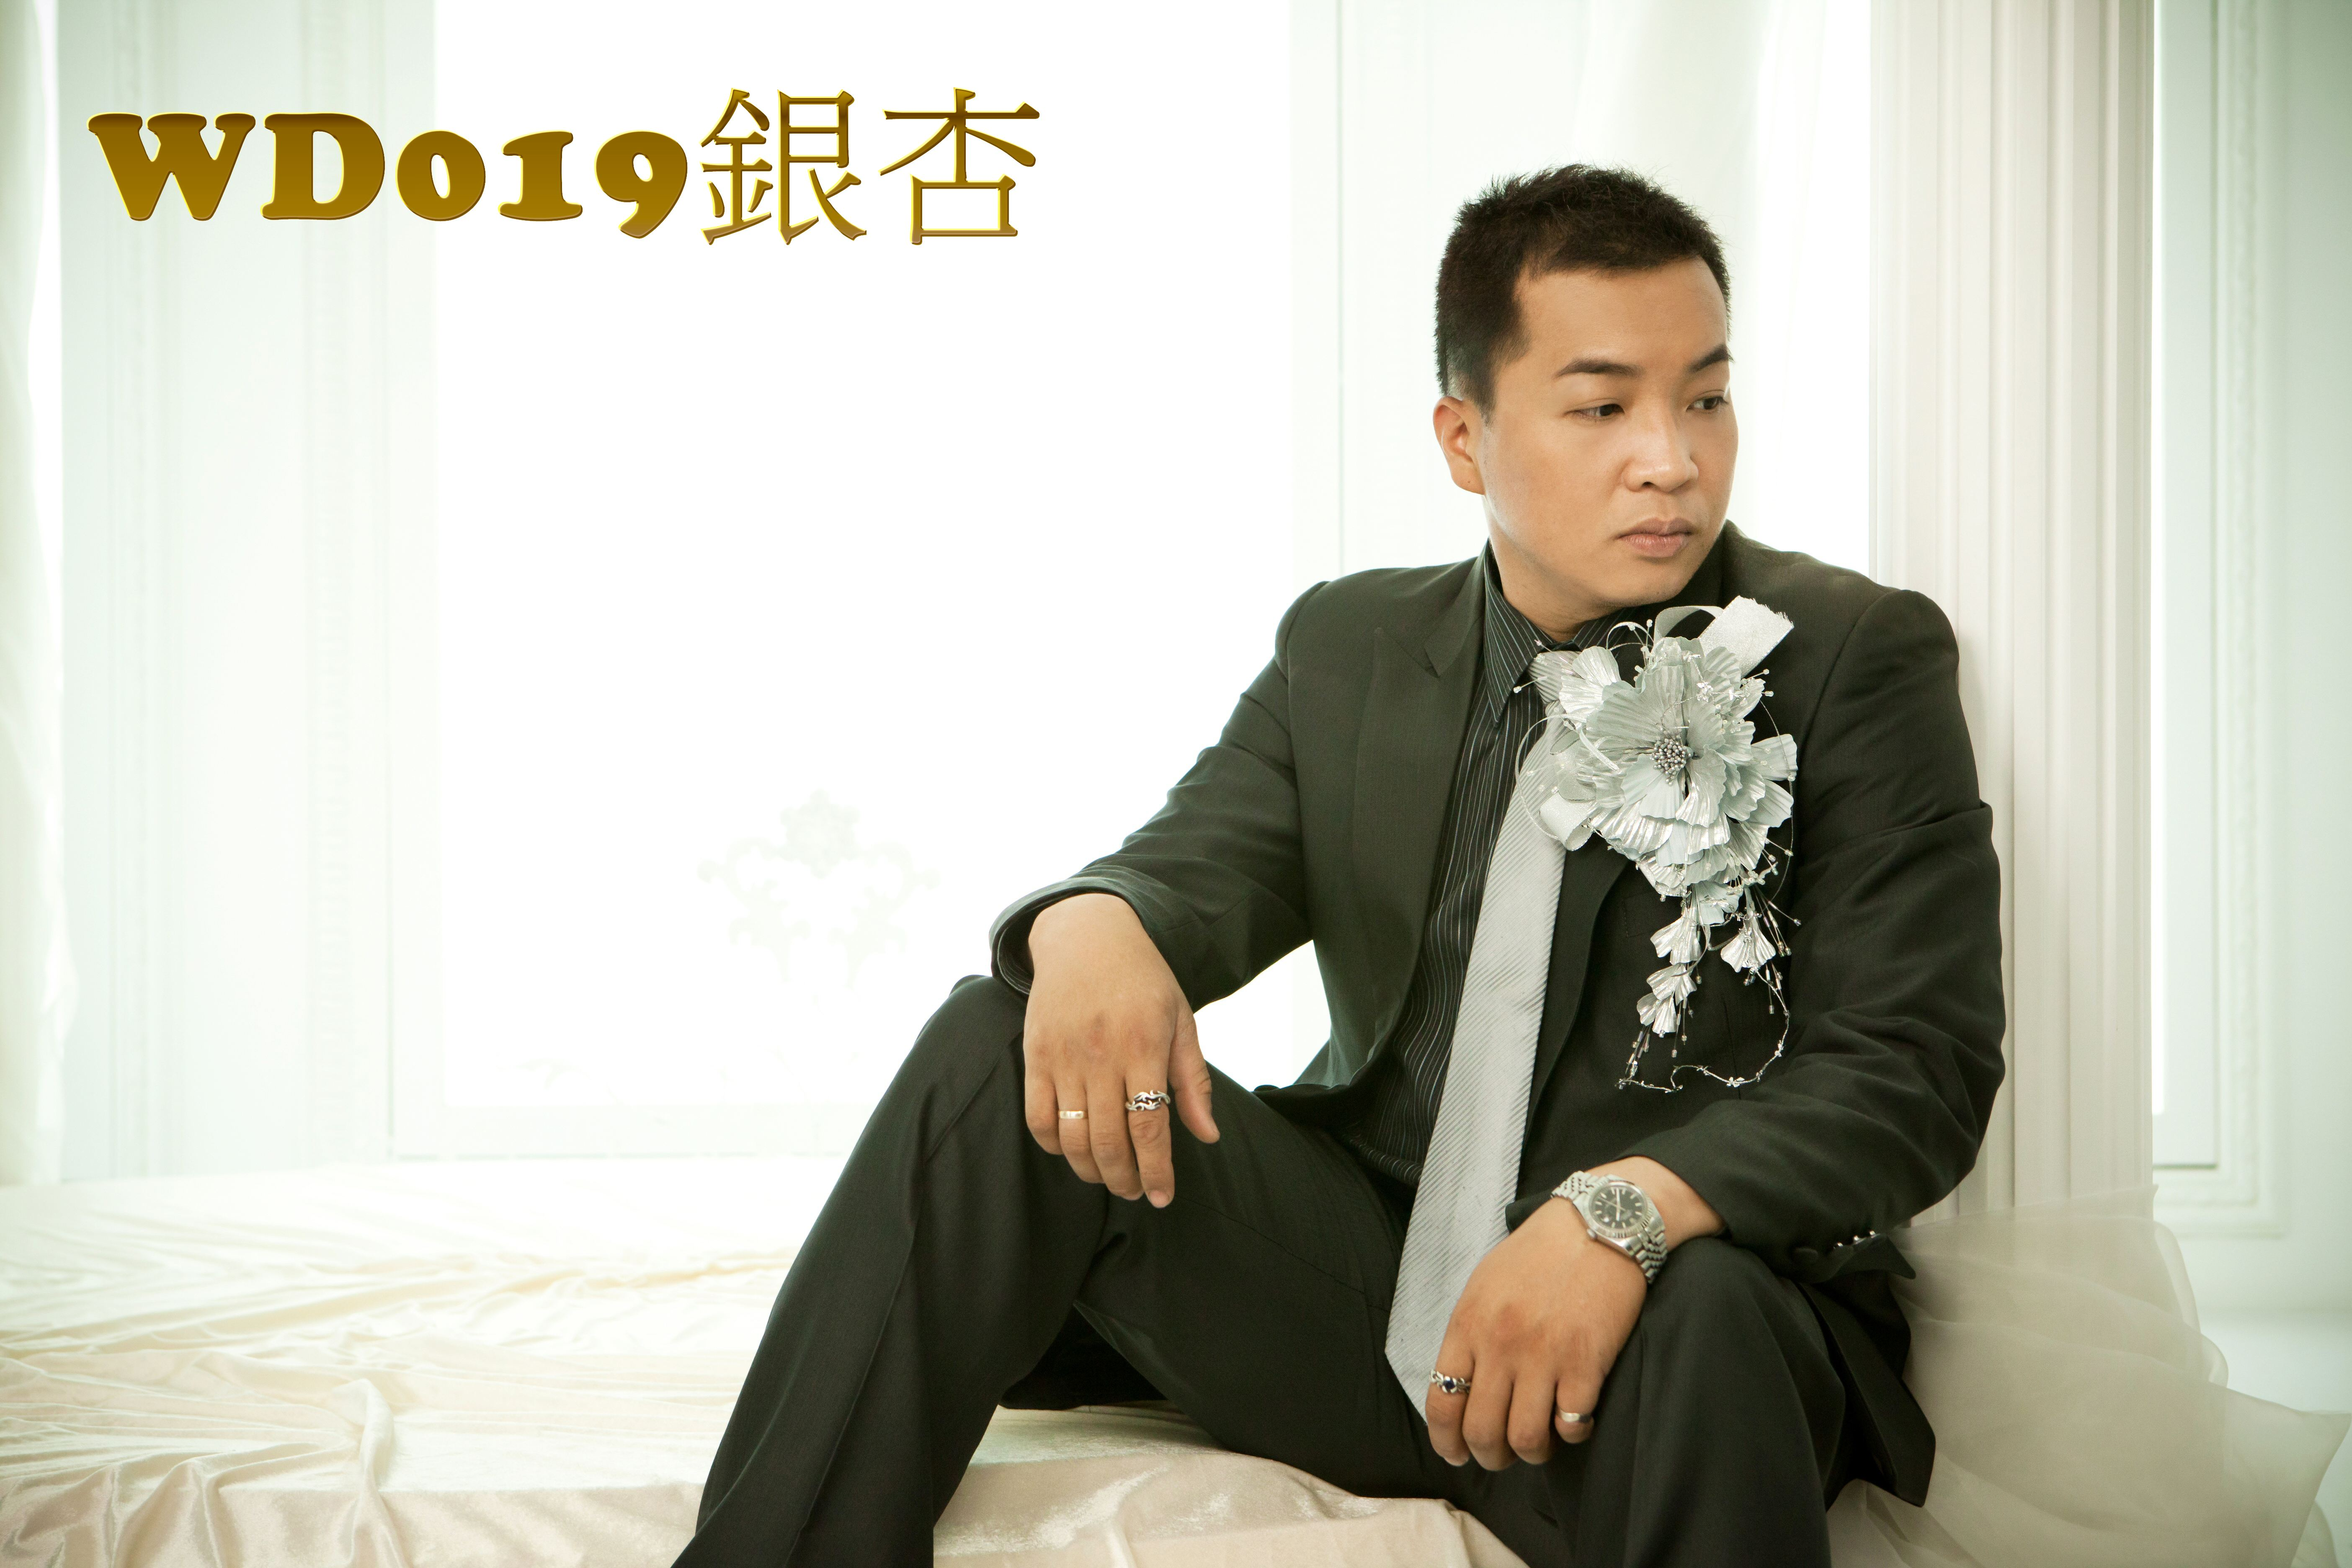 新娘系列WD019 銀杏金囪布2.jpg